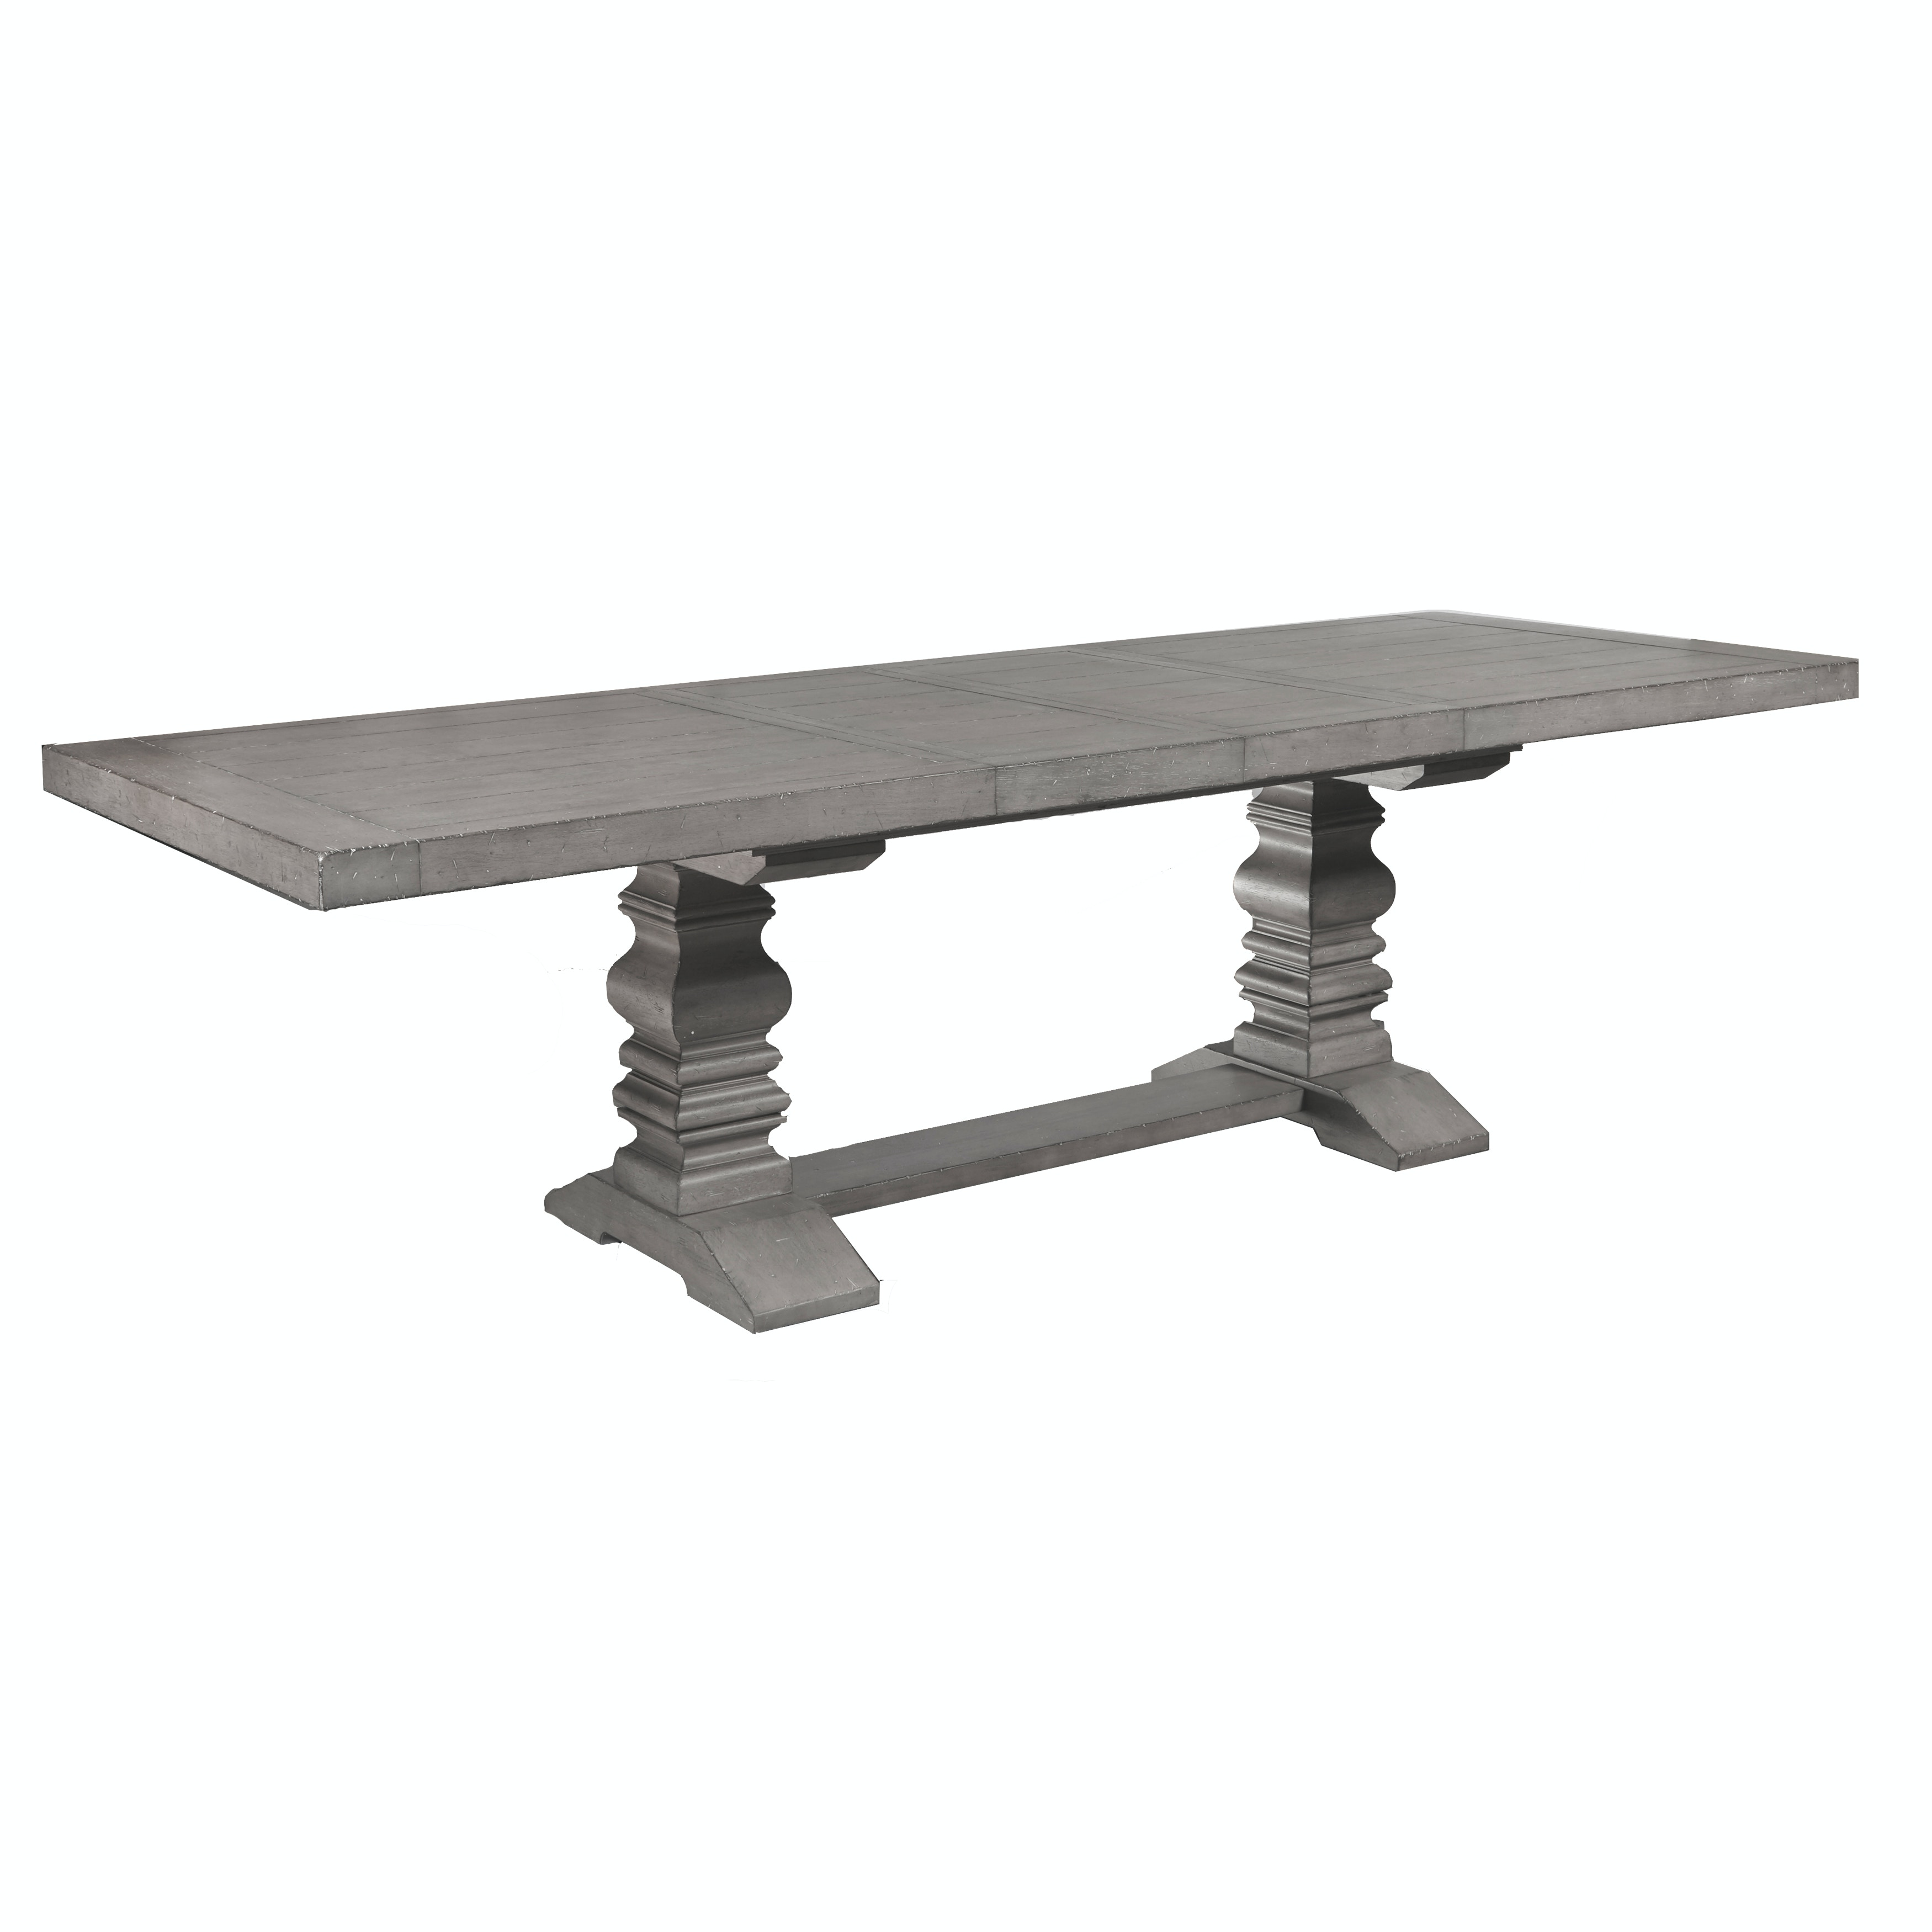 Prospect Hill Trestle Dining Table KT:79392